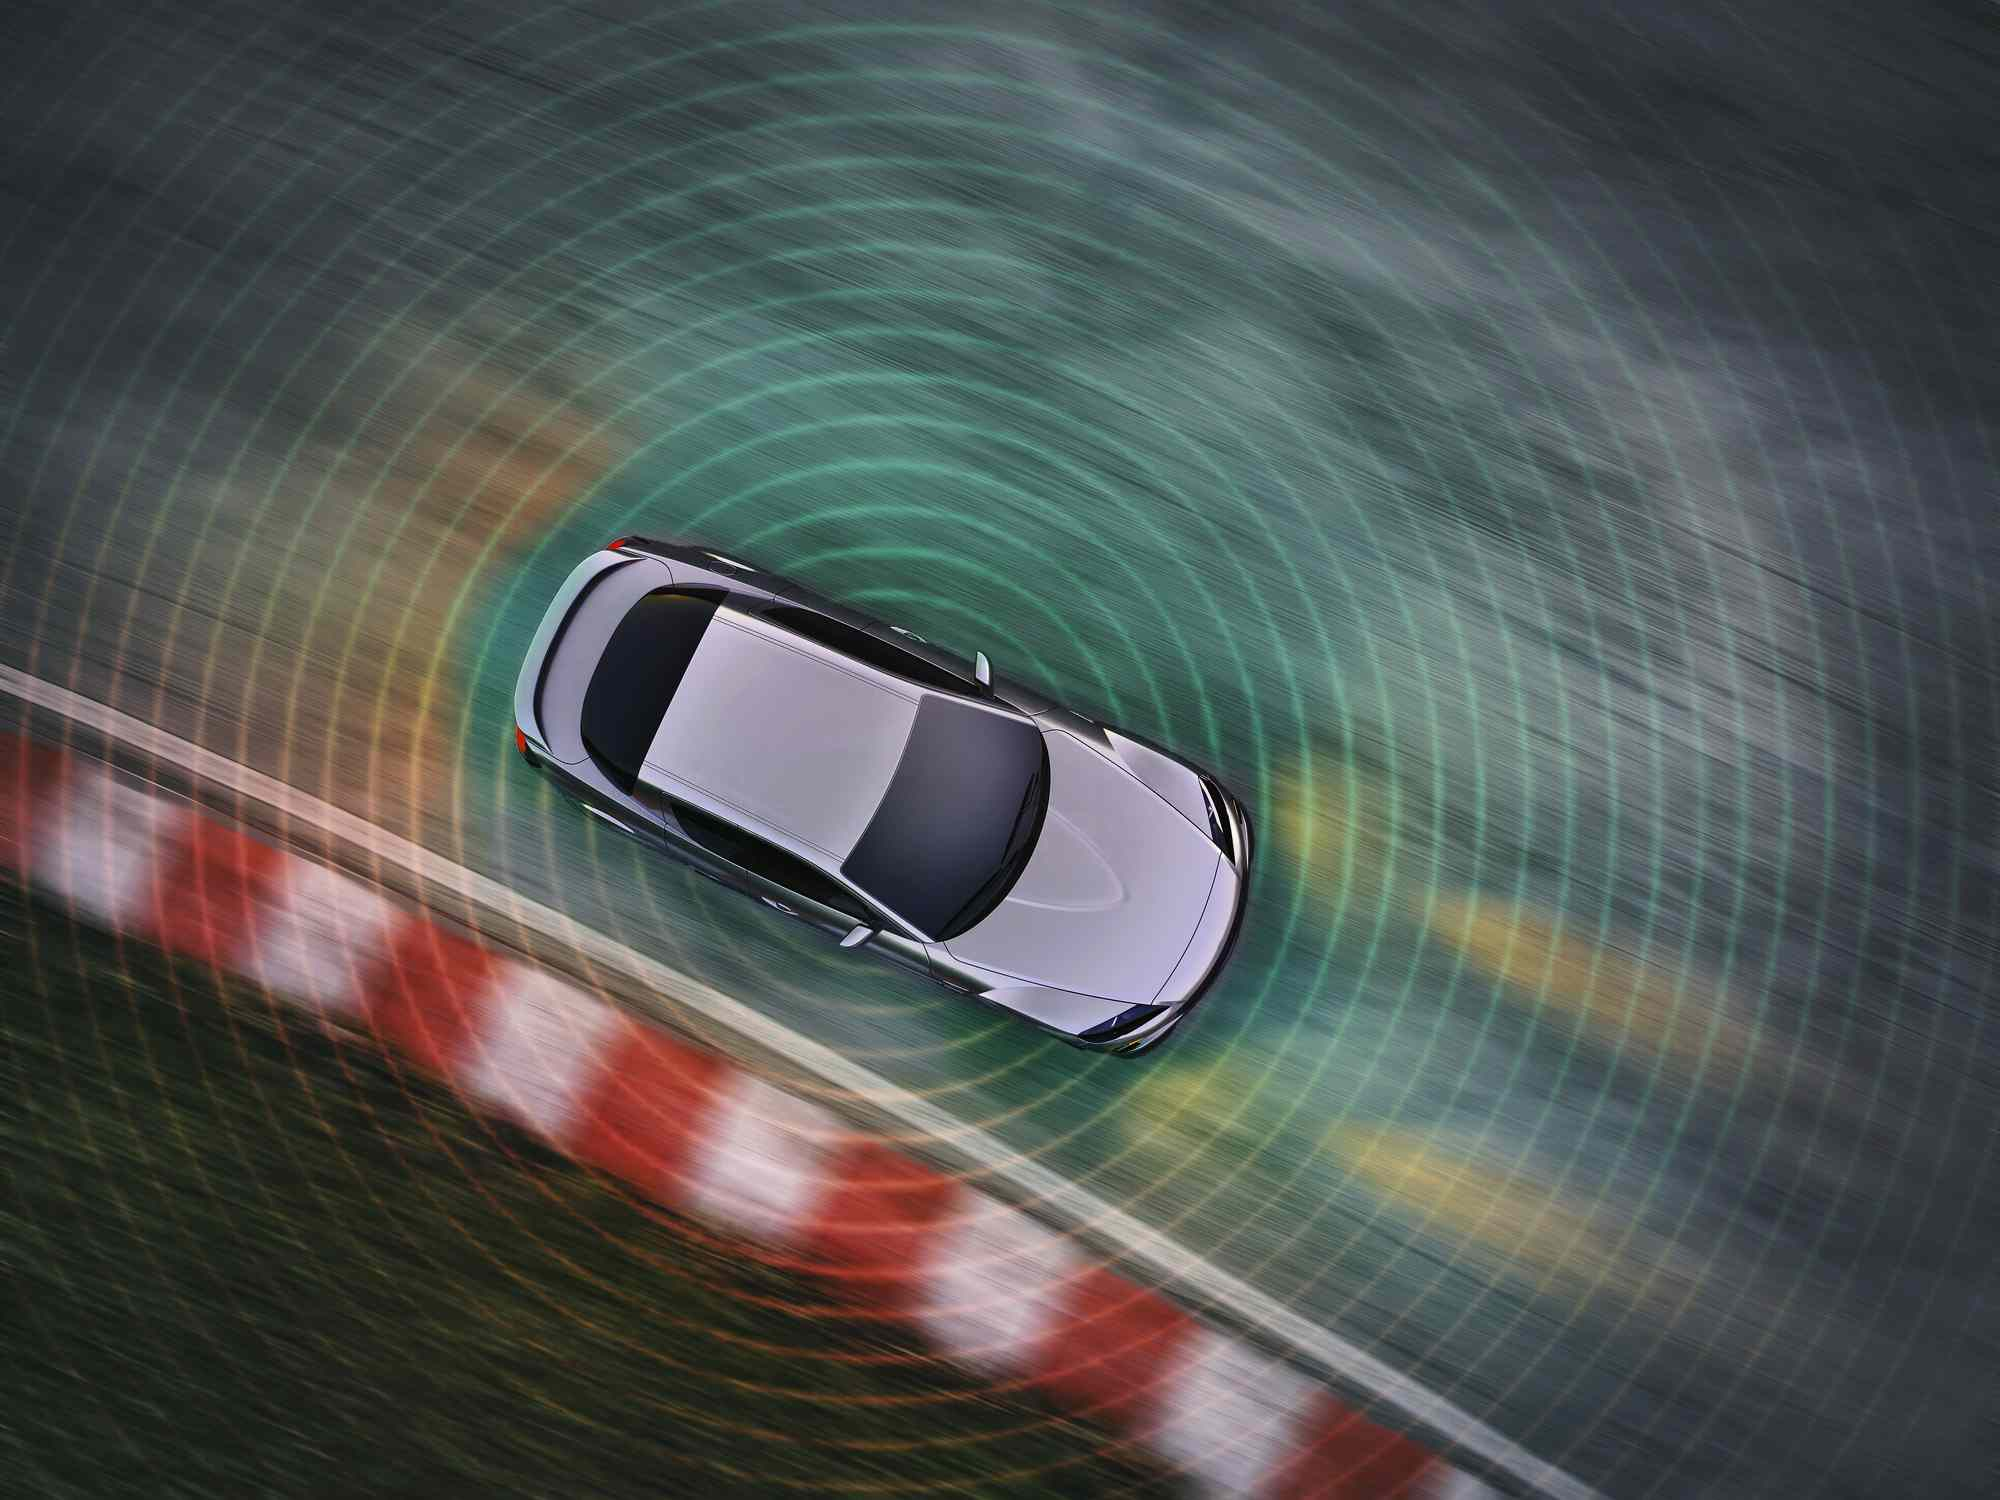 Car driving autonomously with LIDAR sensor